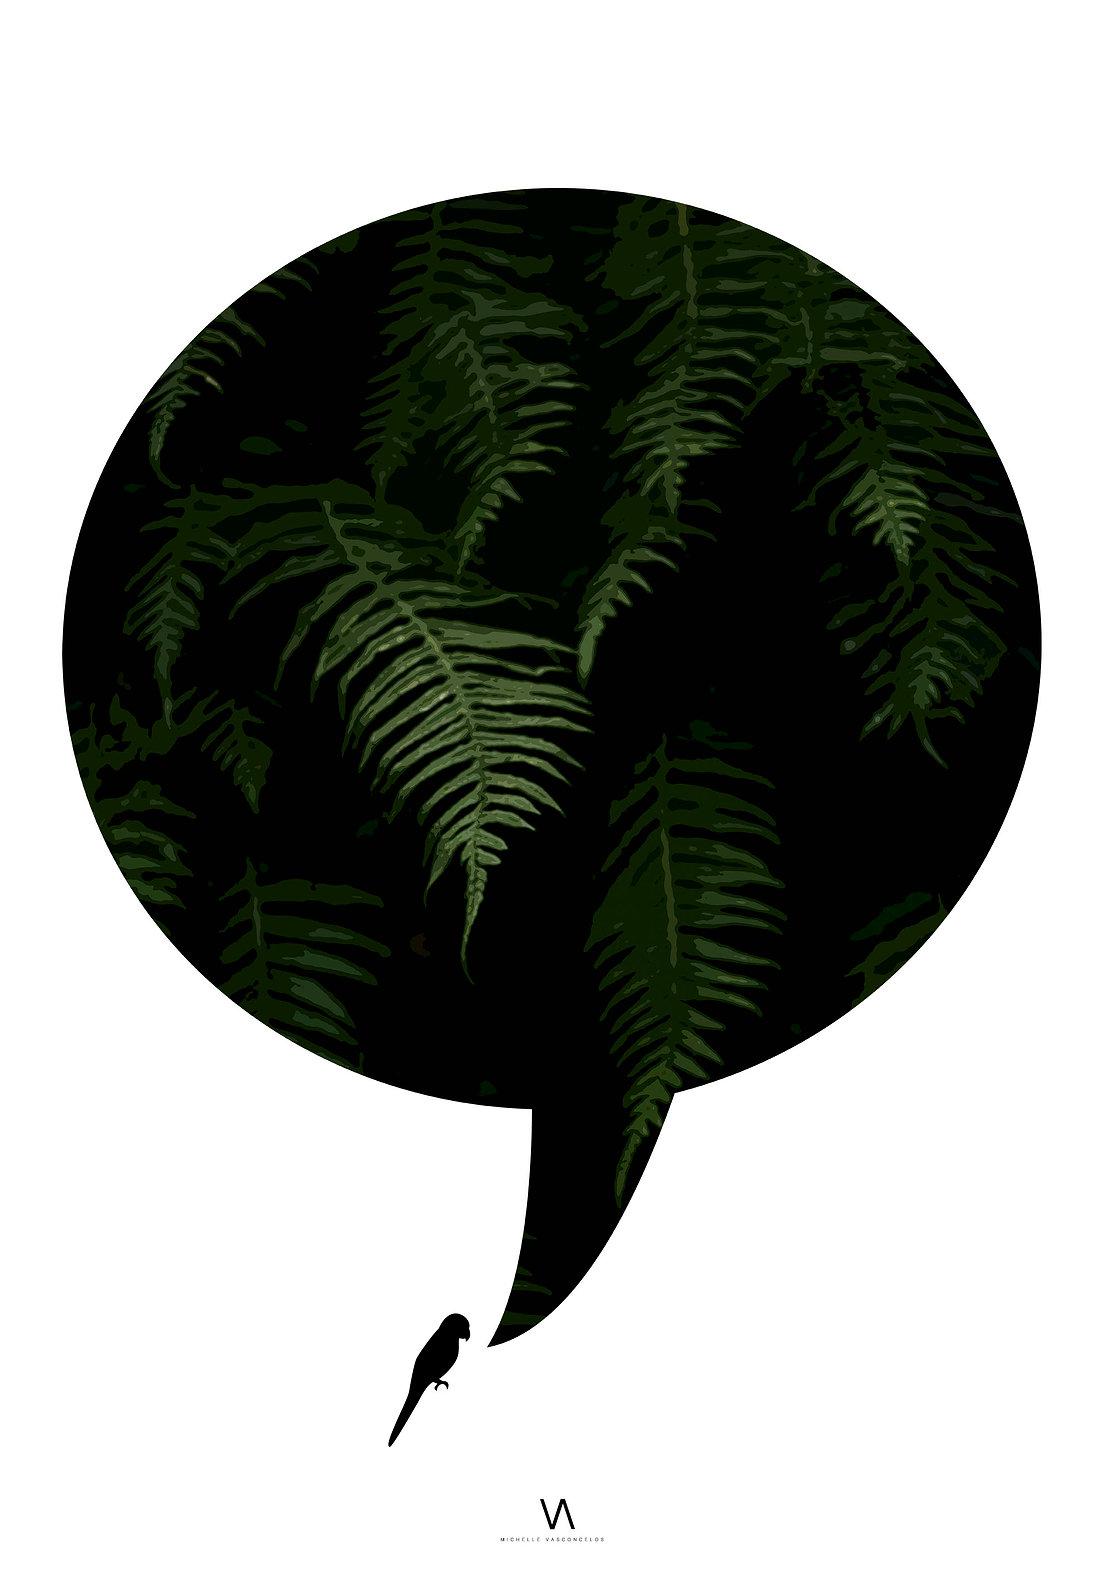 my-bird-speaks-art-print-michelle-vasconcelos